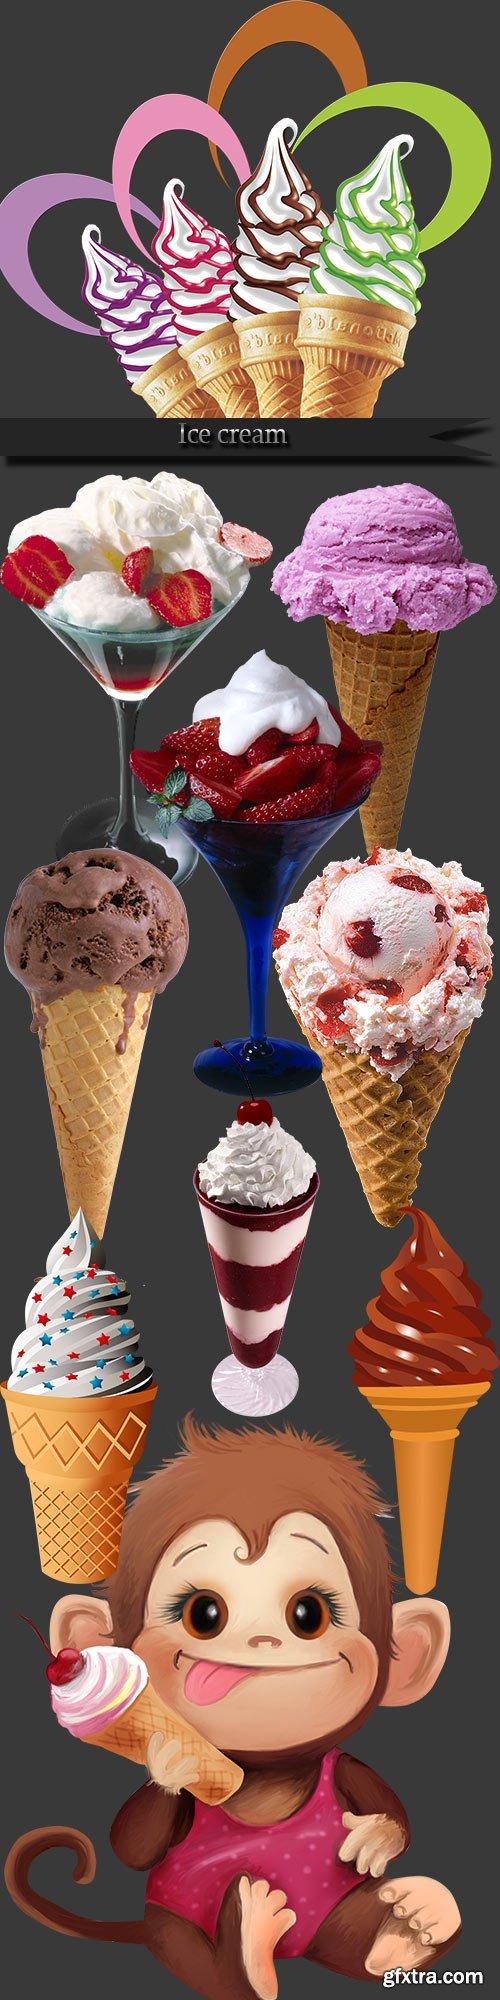 Ice cream on a transparent background